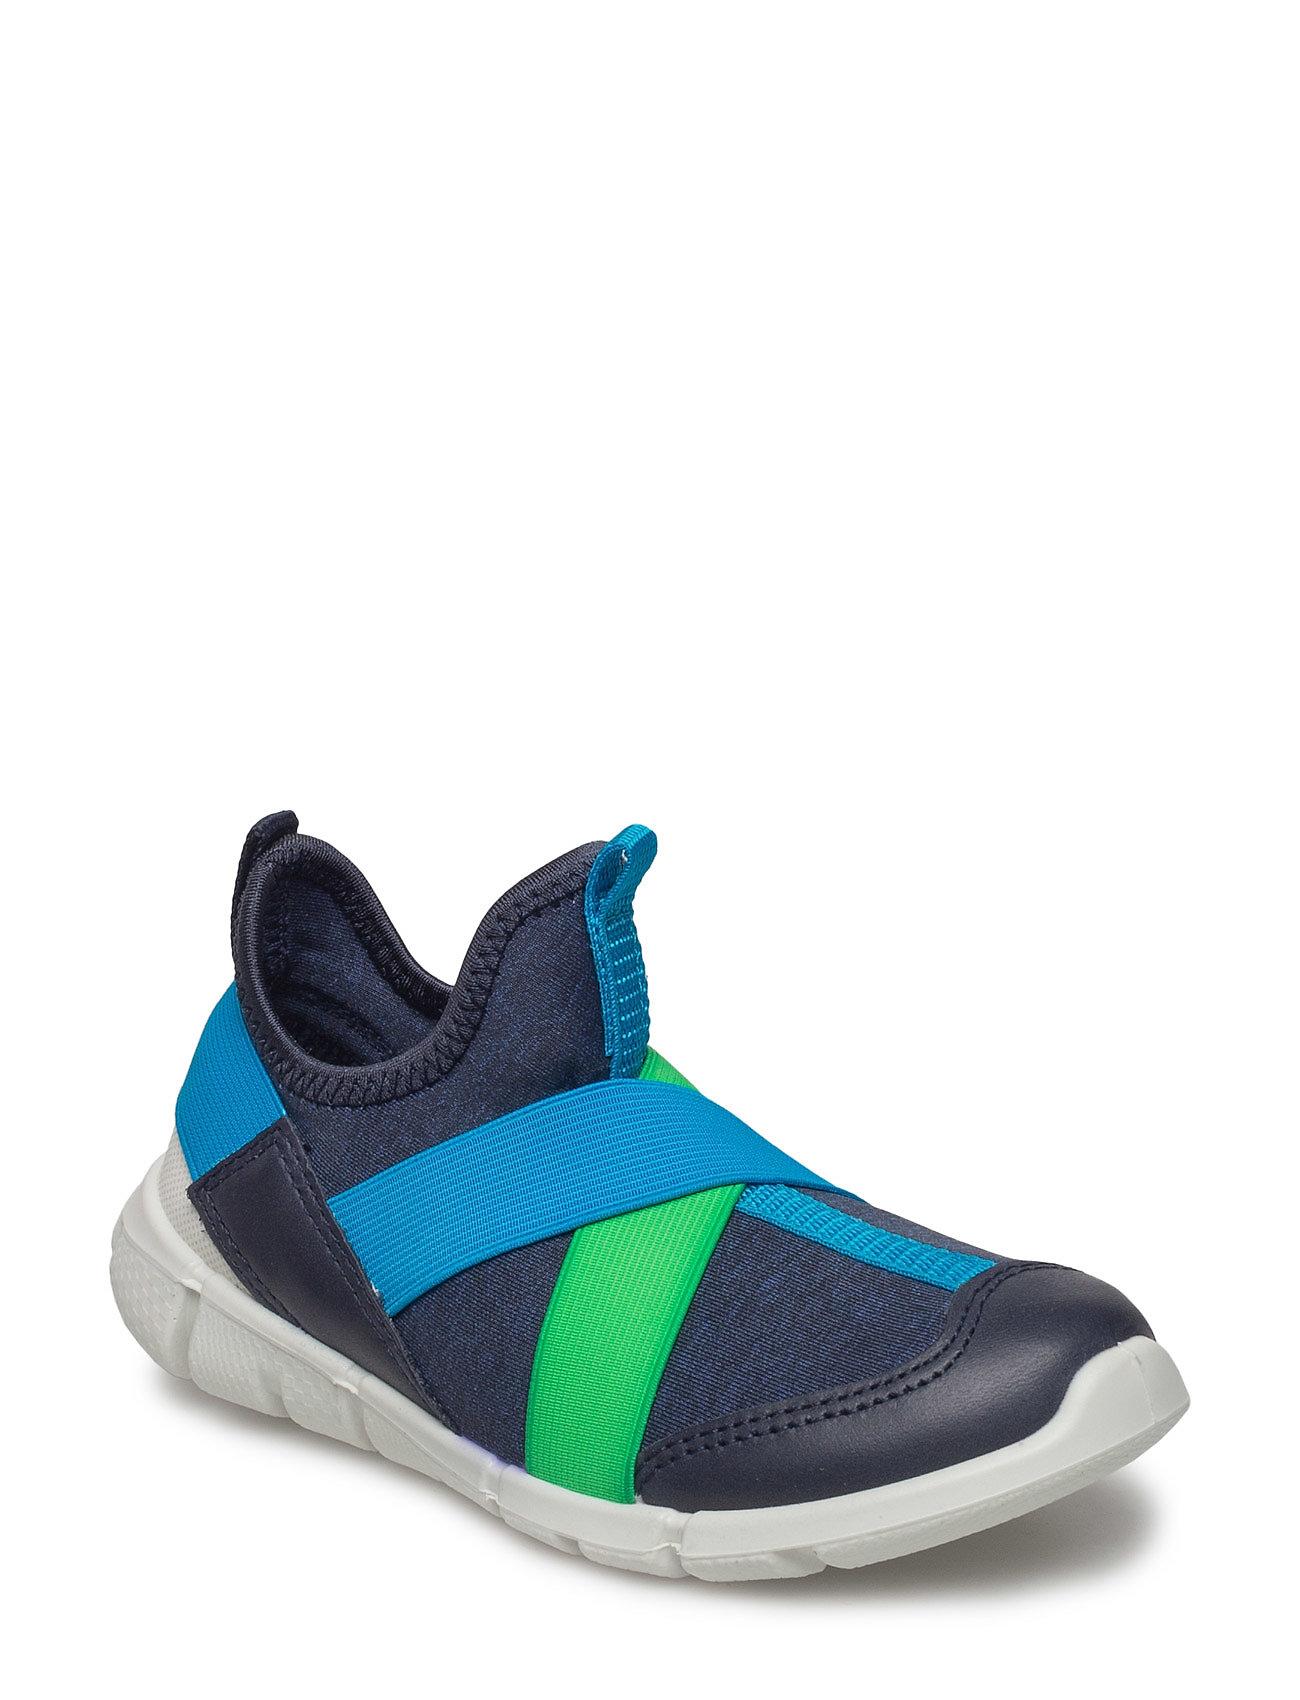 Intrinsic Mini ECCO Sko & Sneakers til Børn i